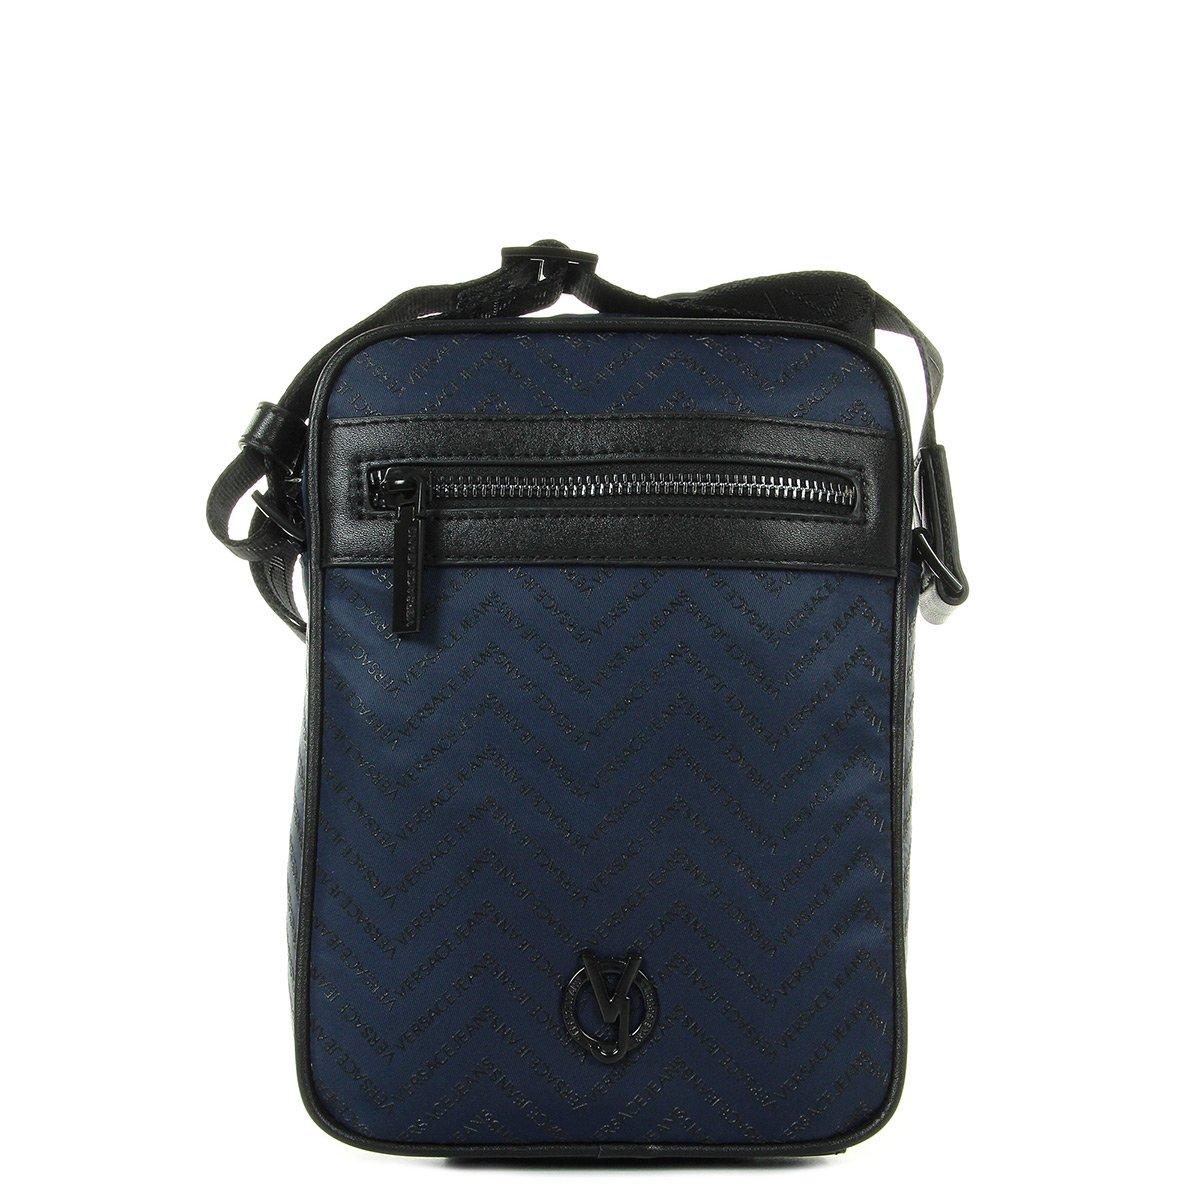 versace jeans e1yrbb 3270088 metal logo black leather side bag super  popular 1dd16 e2372 727fce50ad325